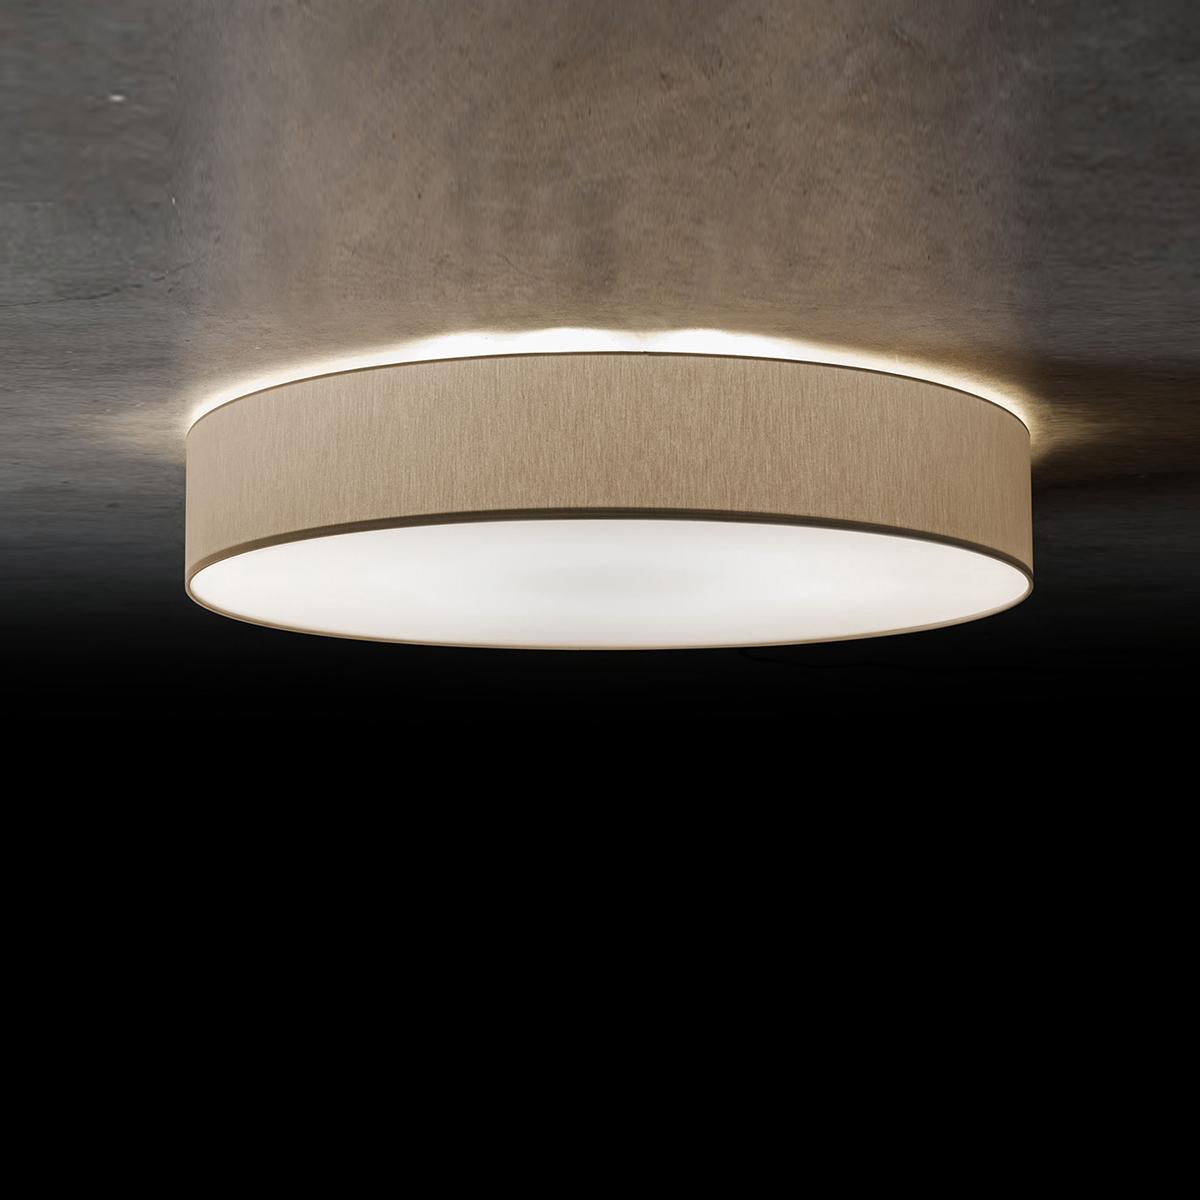 holtk tter leuchten vita 6 deckenleuchte 70 cm. Black Bedroom Furniture Sets. Home Design Ideas